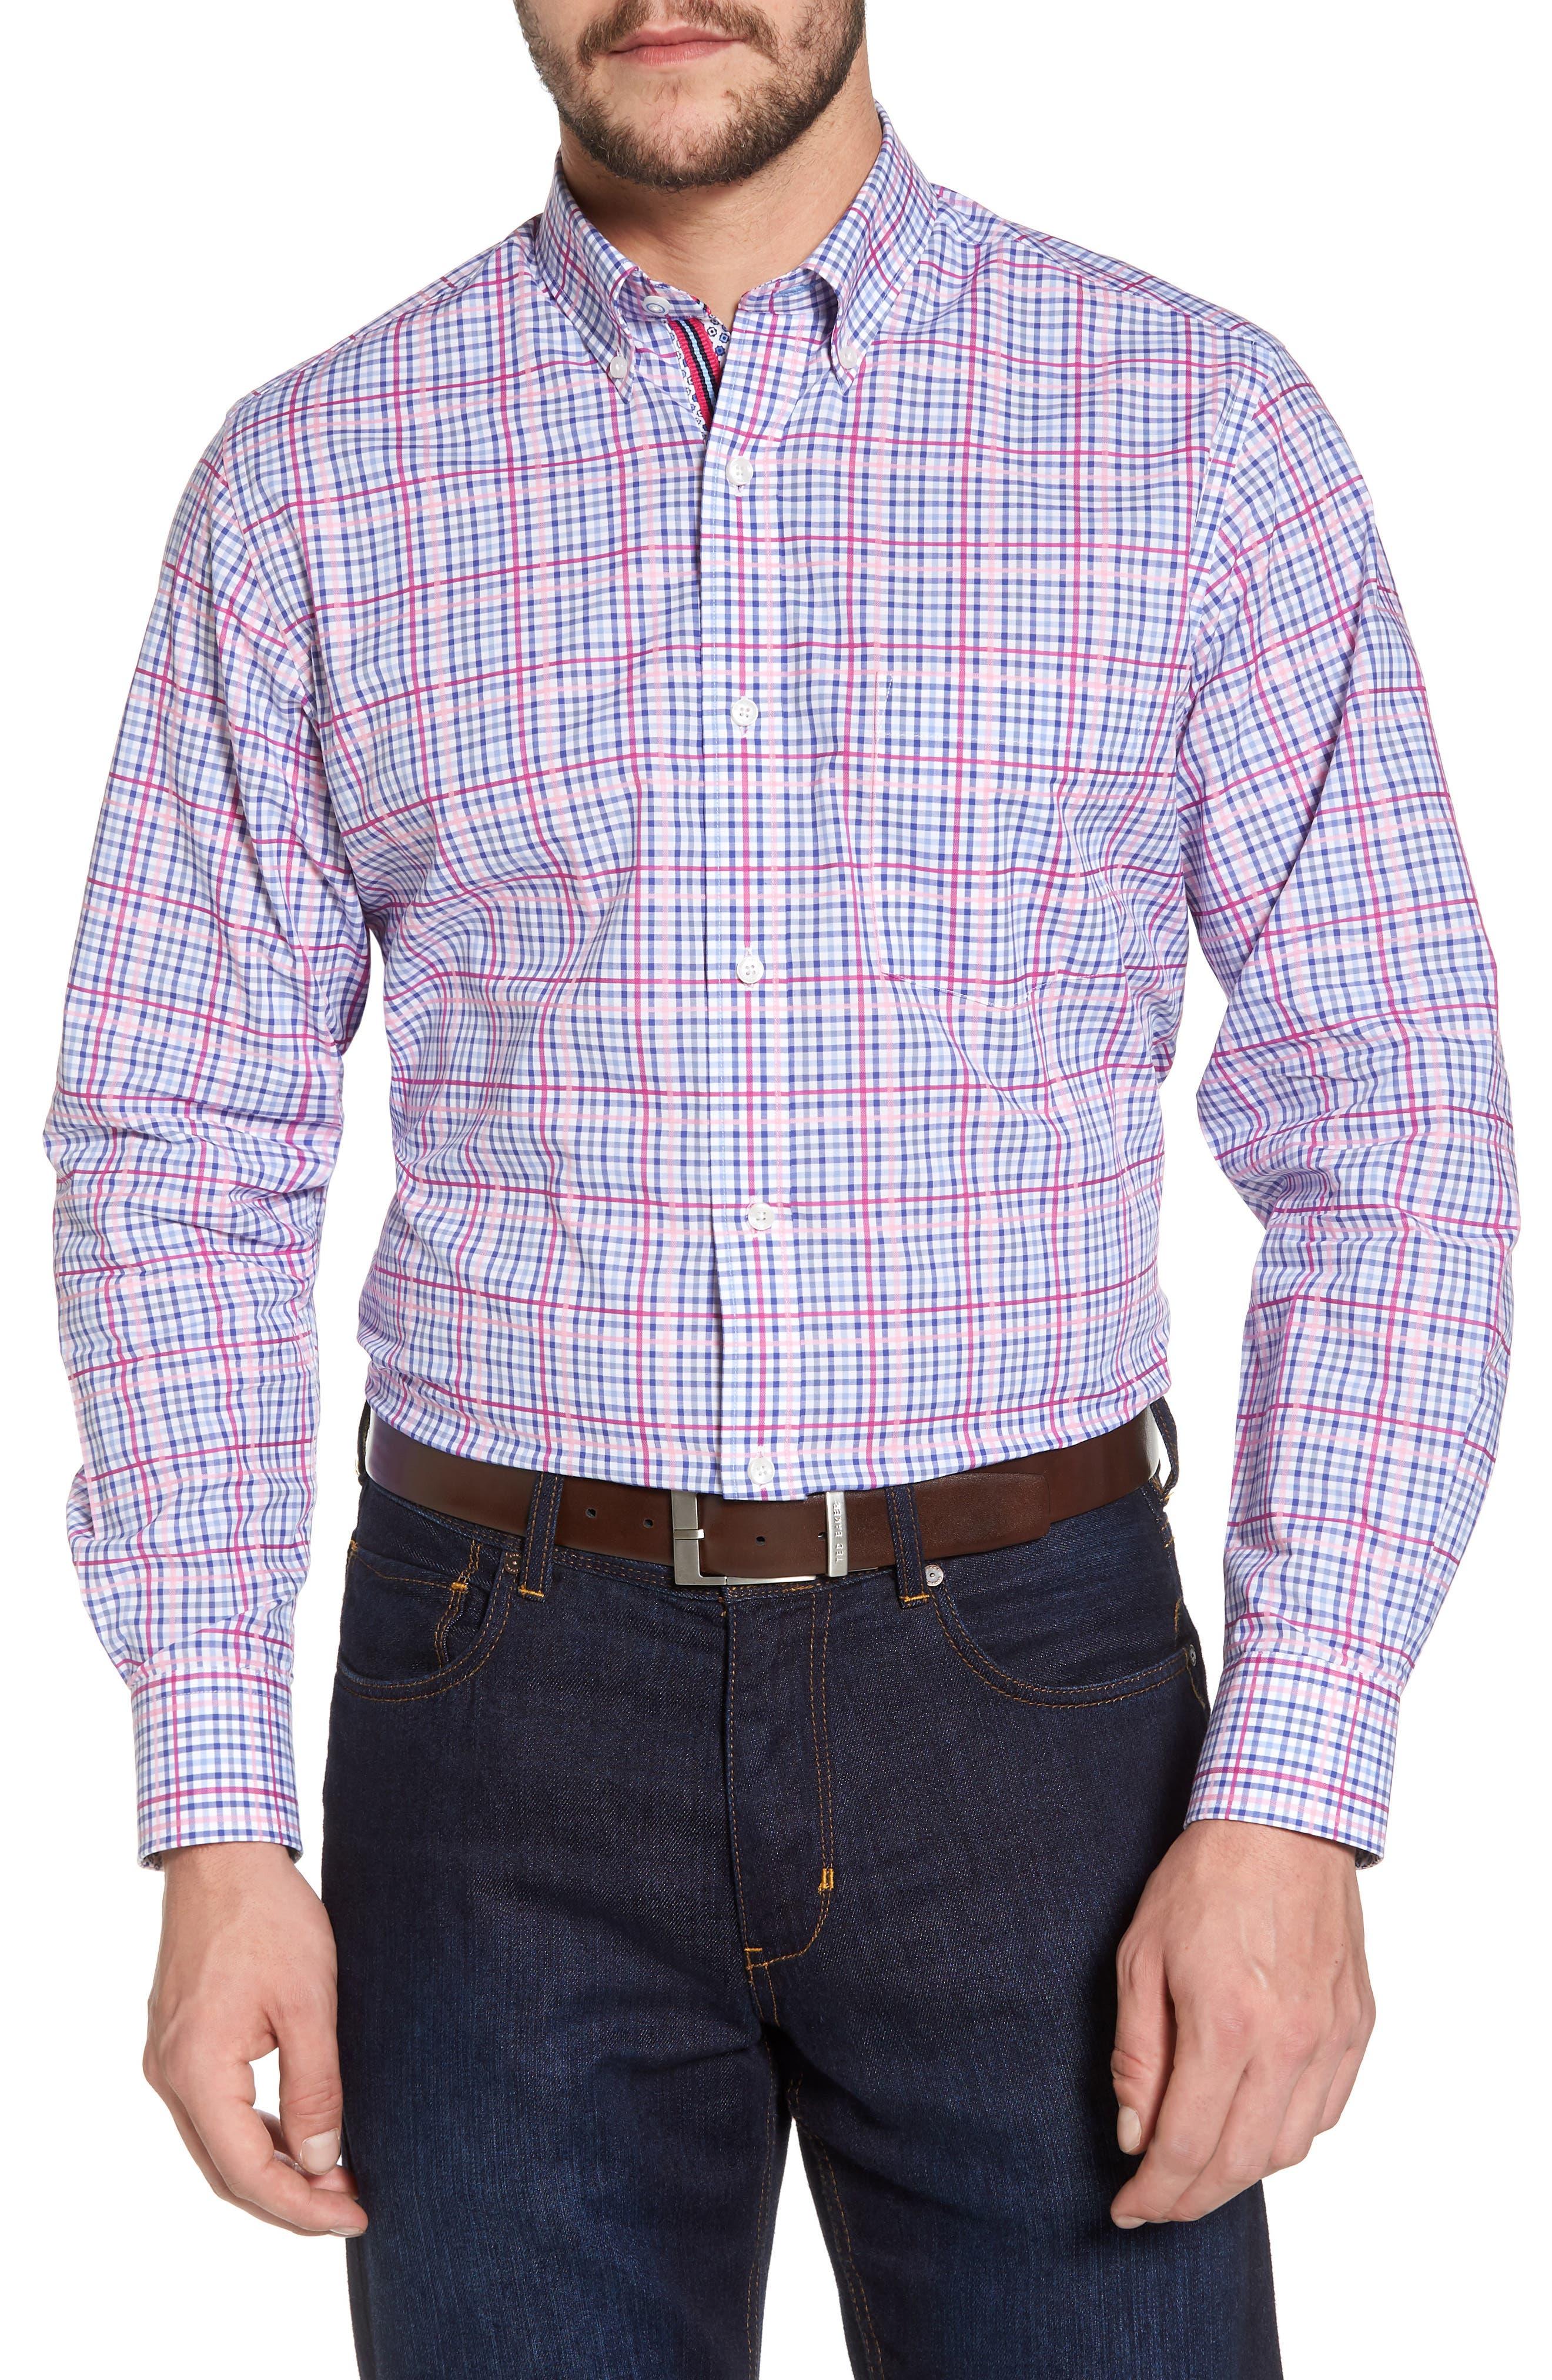 Aidren Regular Fit Plaid Sport Shirt,                             Main thumbnail 1, color,                             Pink